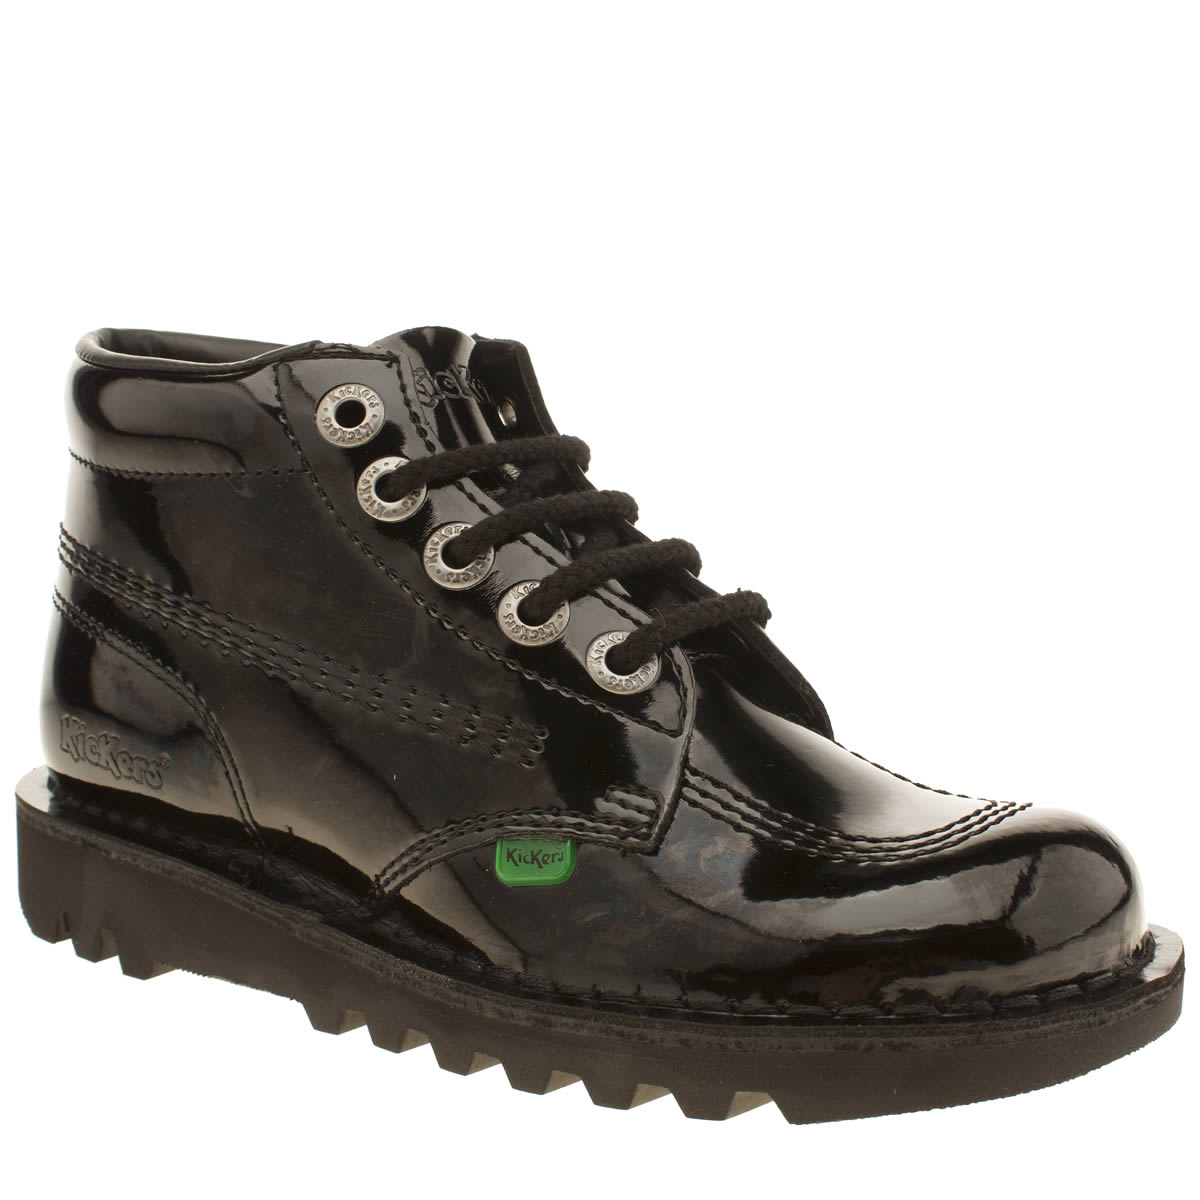 Black kicker sandals - Black Kicker Sandals 59